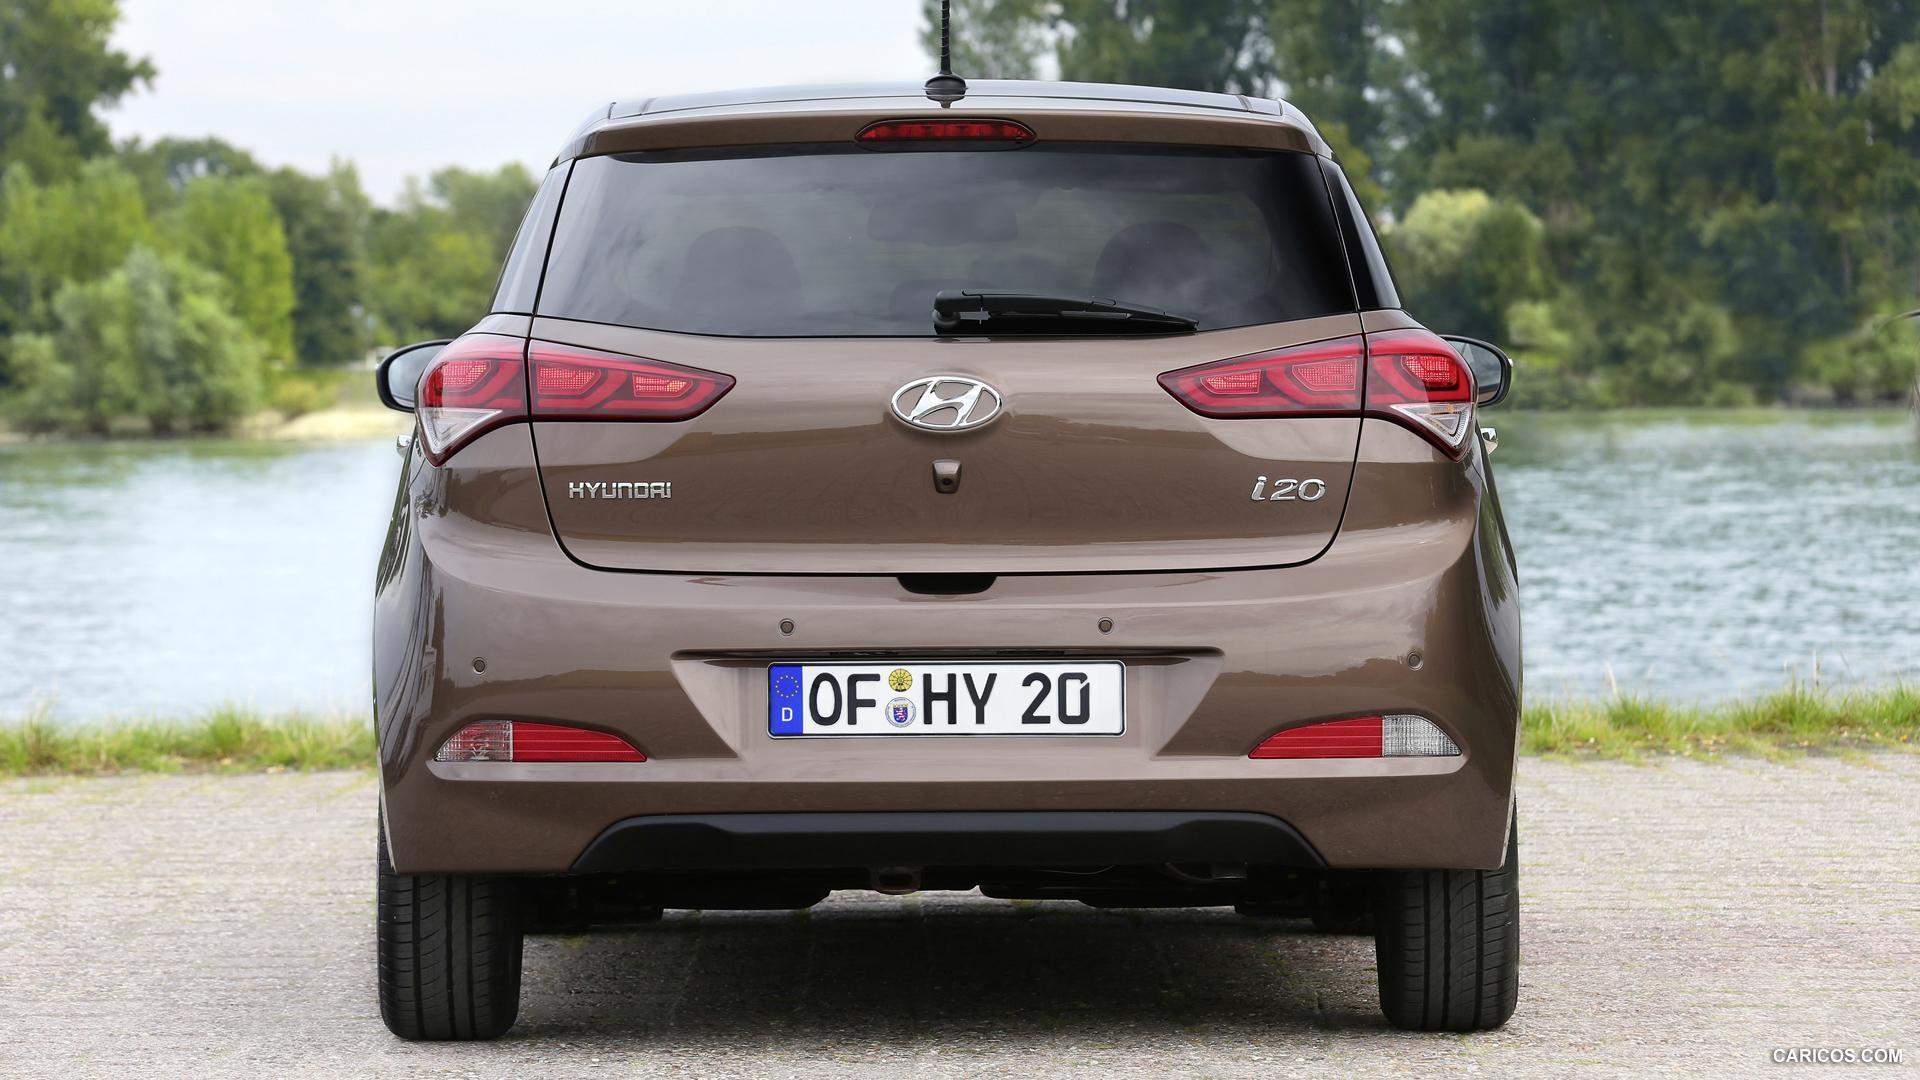 Hyundai i20 Windows Wallpapers